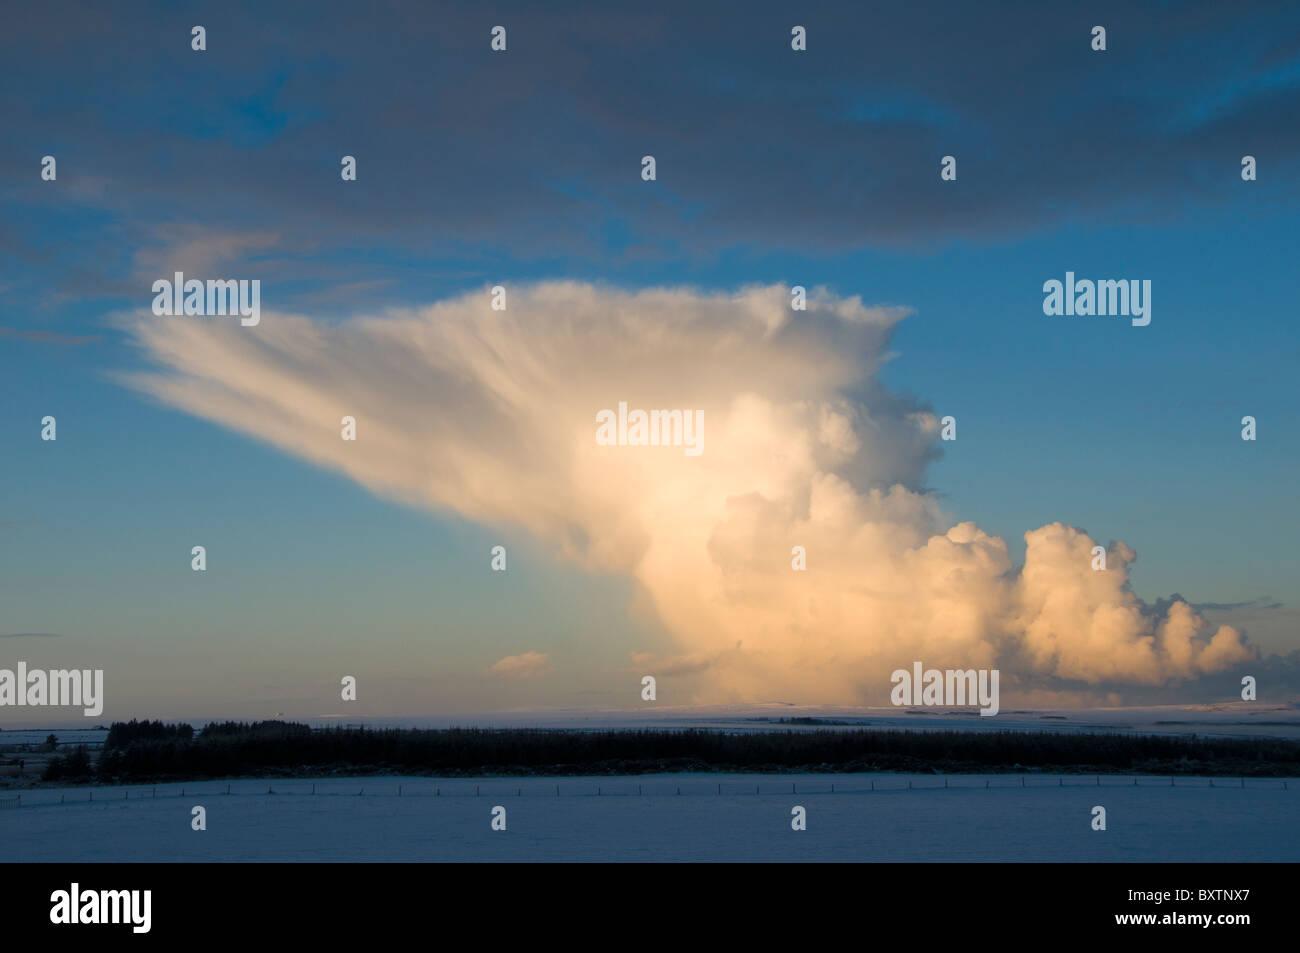 Cumulonimbus shower cloud over Caithness, Scotland, UK - Stock Image